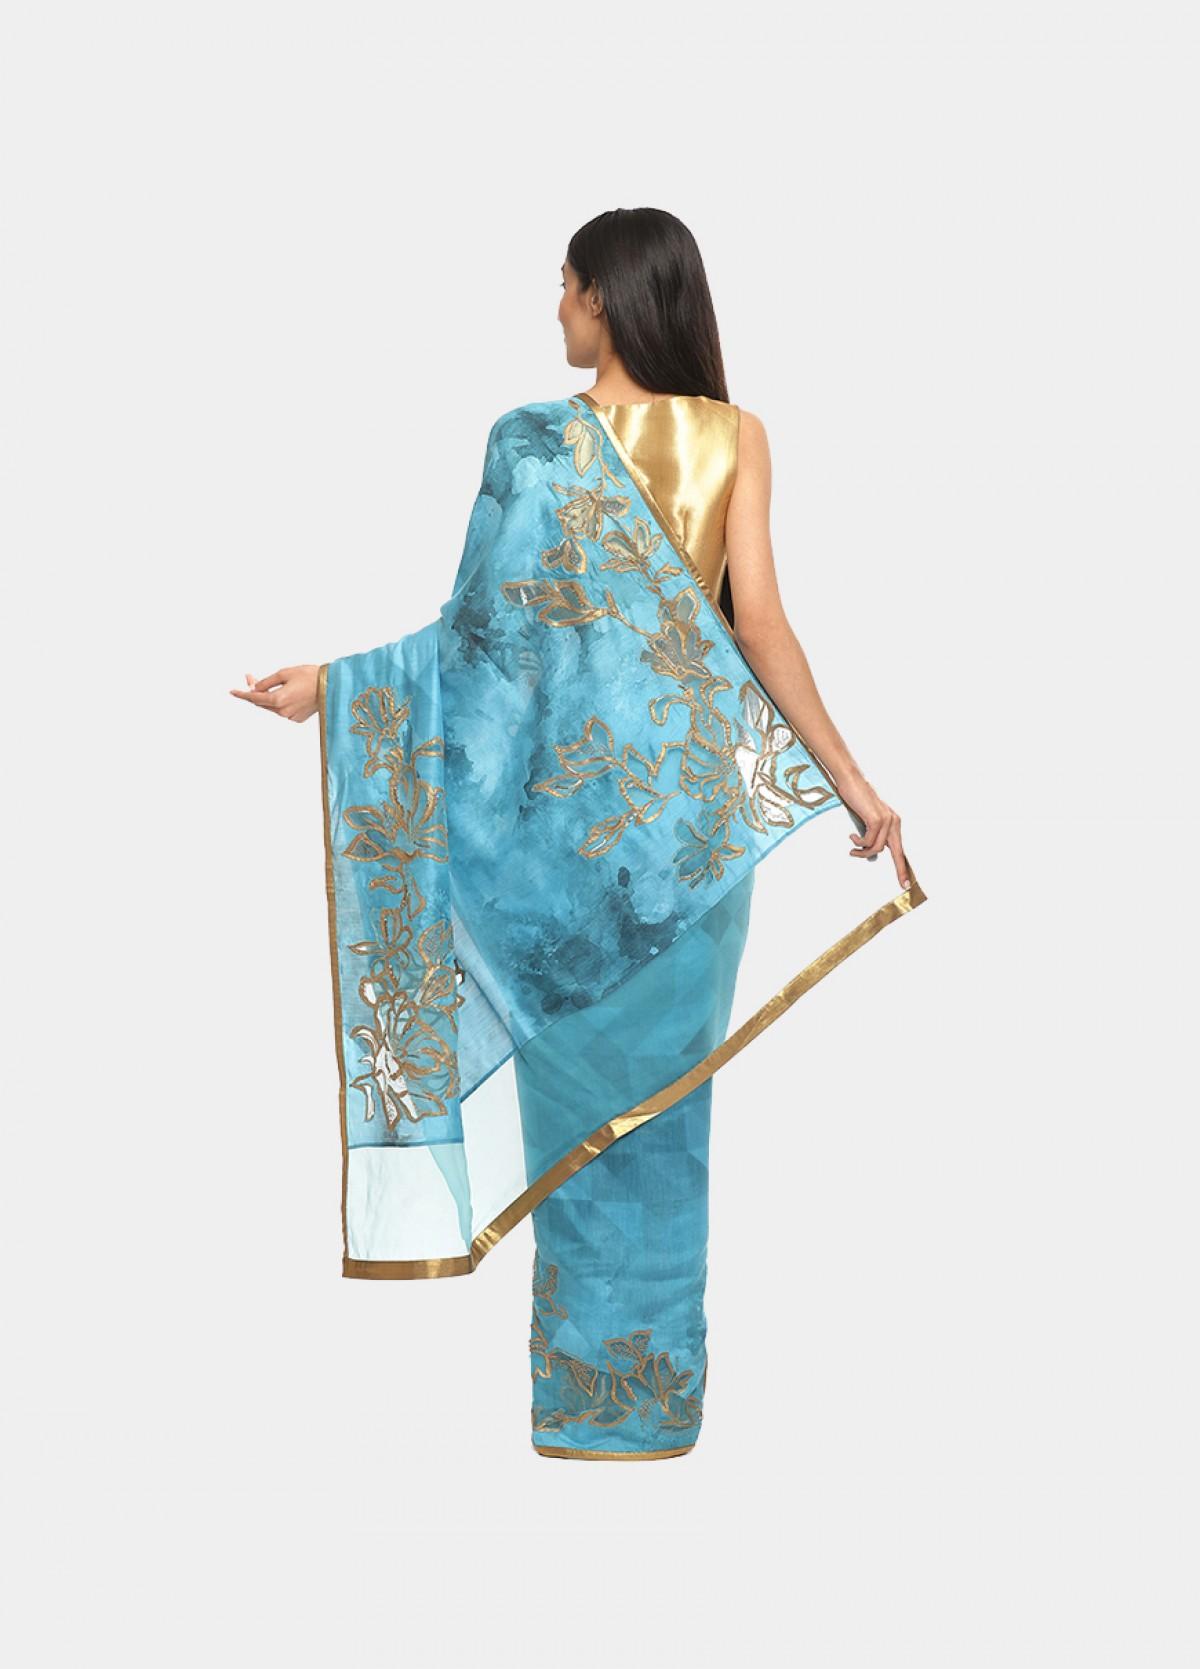 The Silk Blue Embroidered Sari